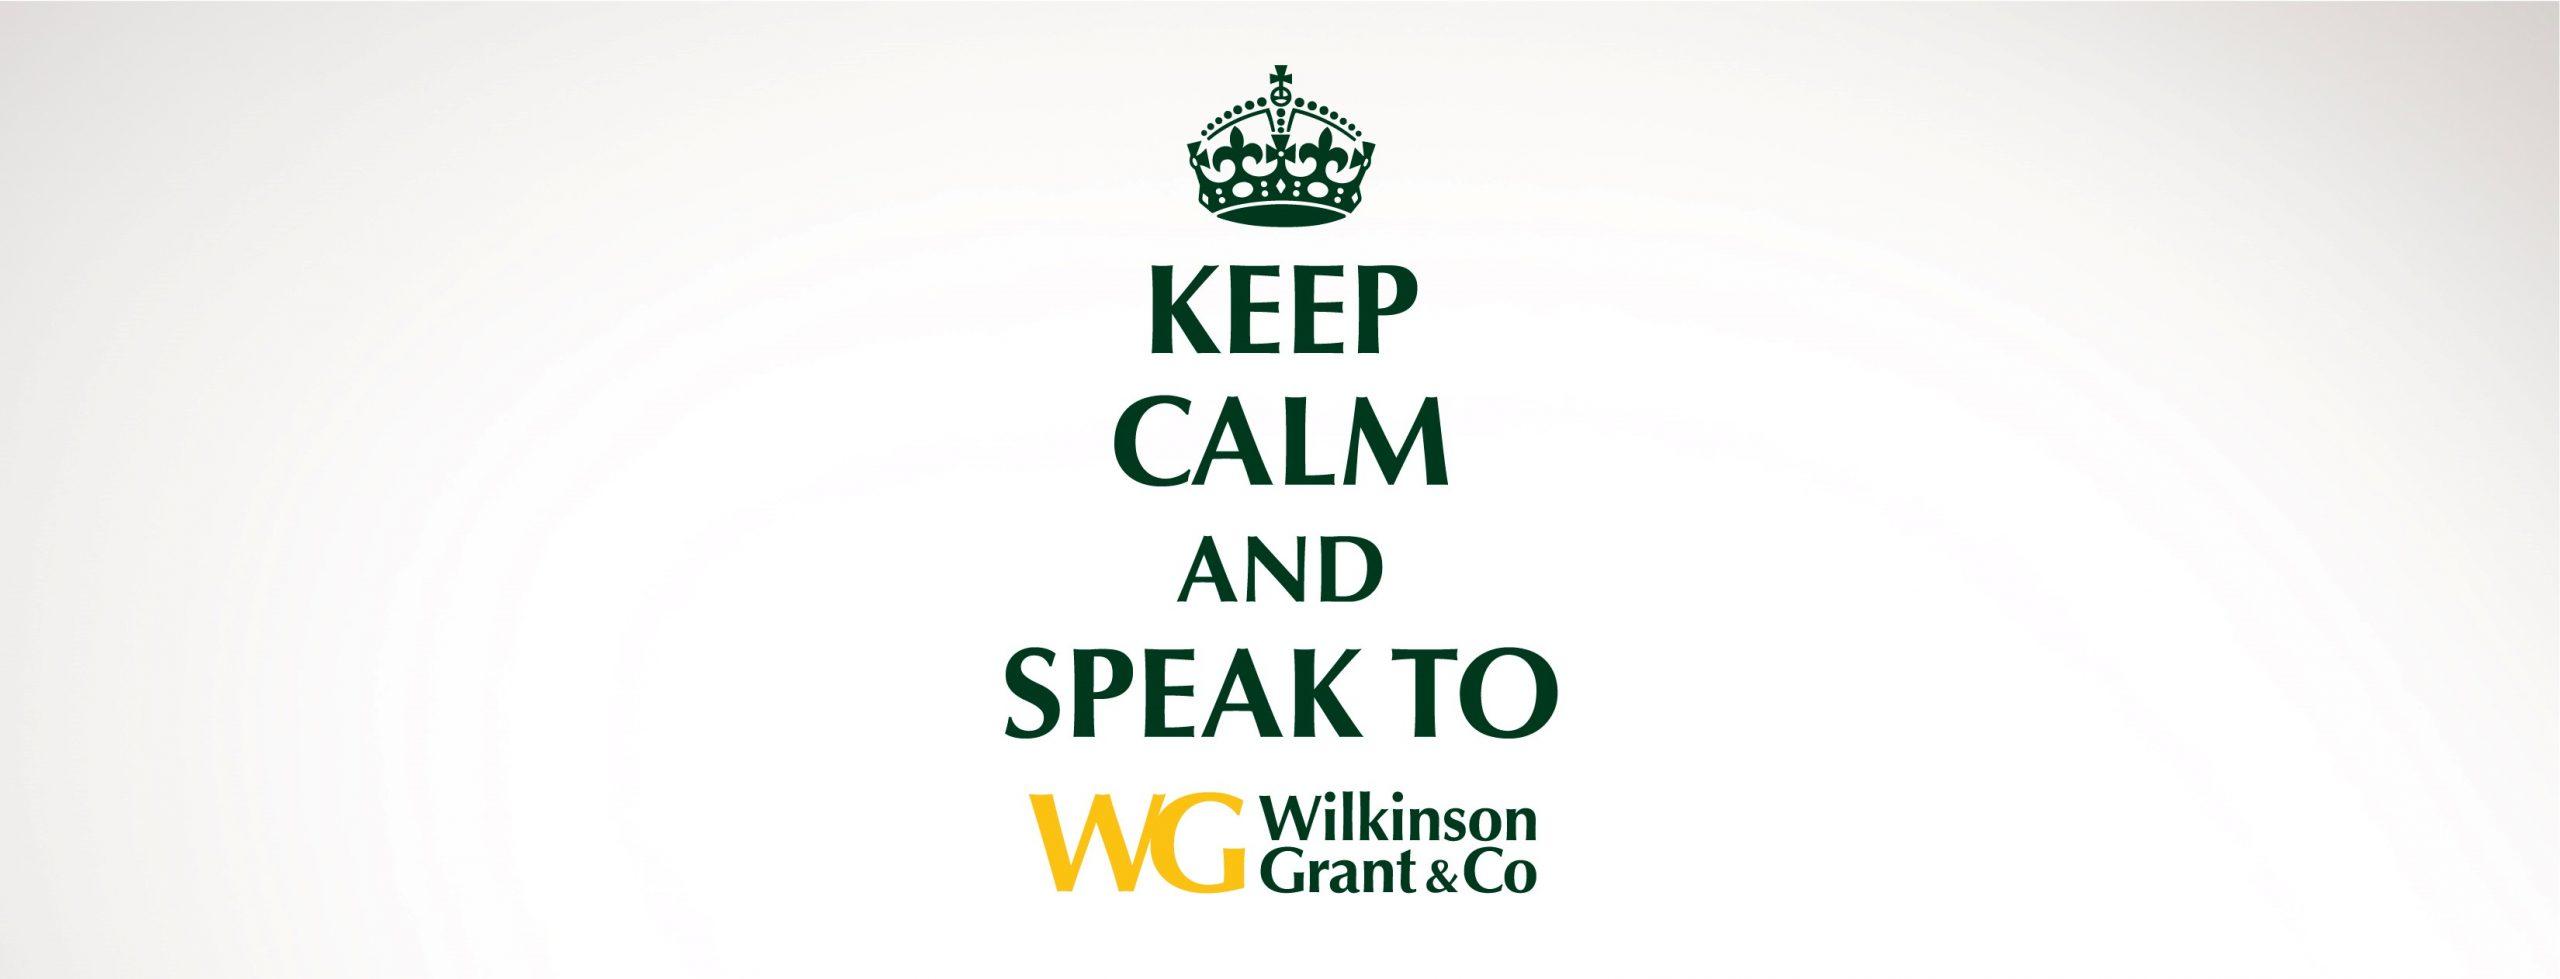 KEEP CALM -  SPEAK TO WILKINSON GRANT & CO